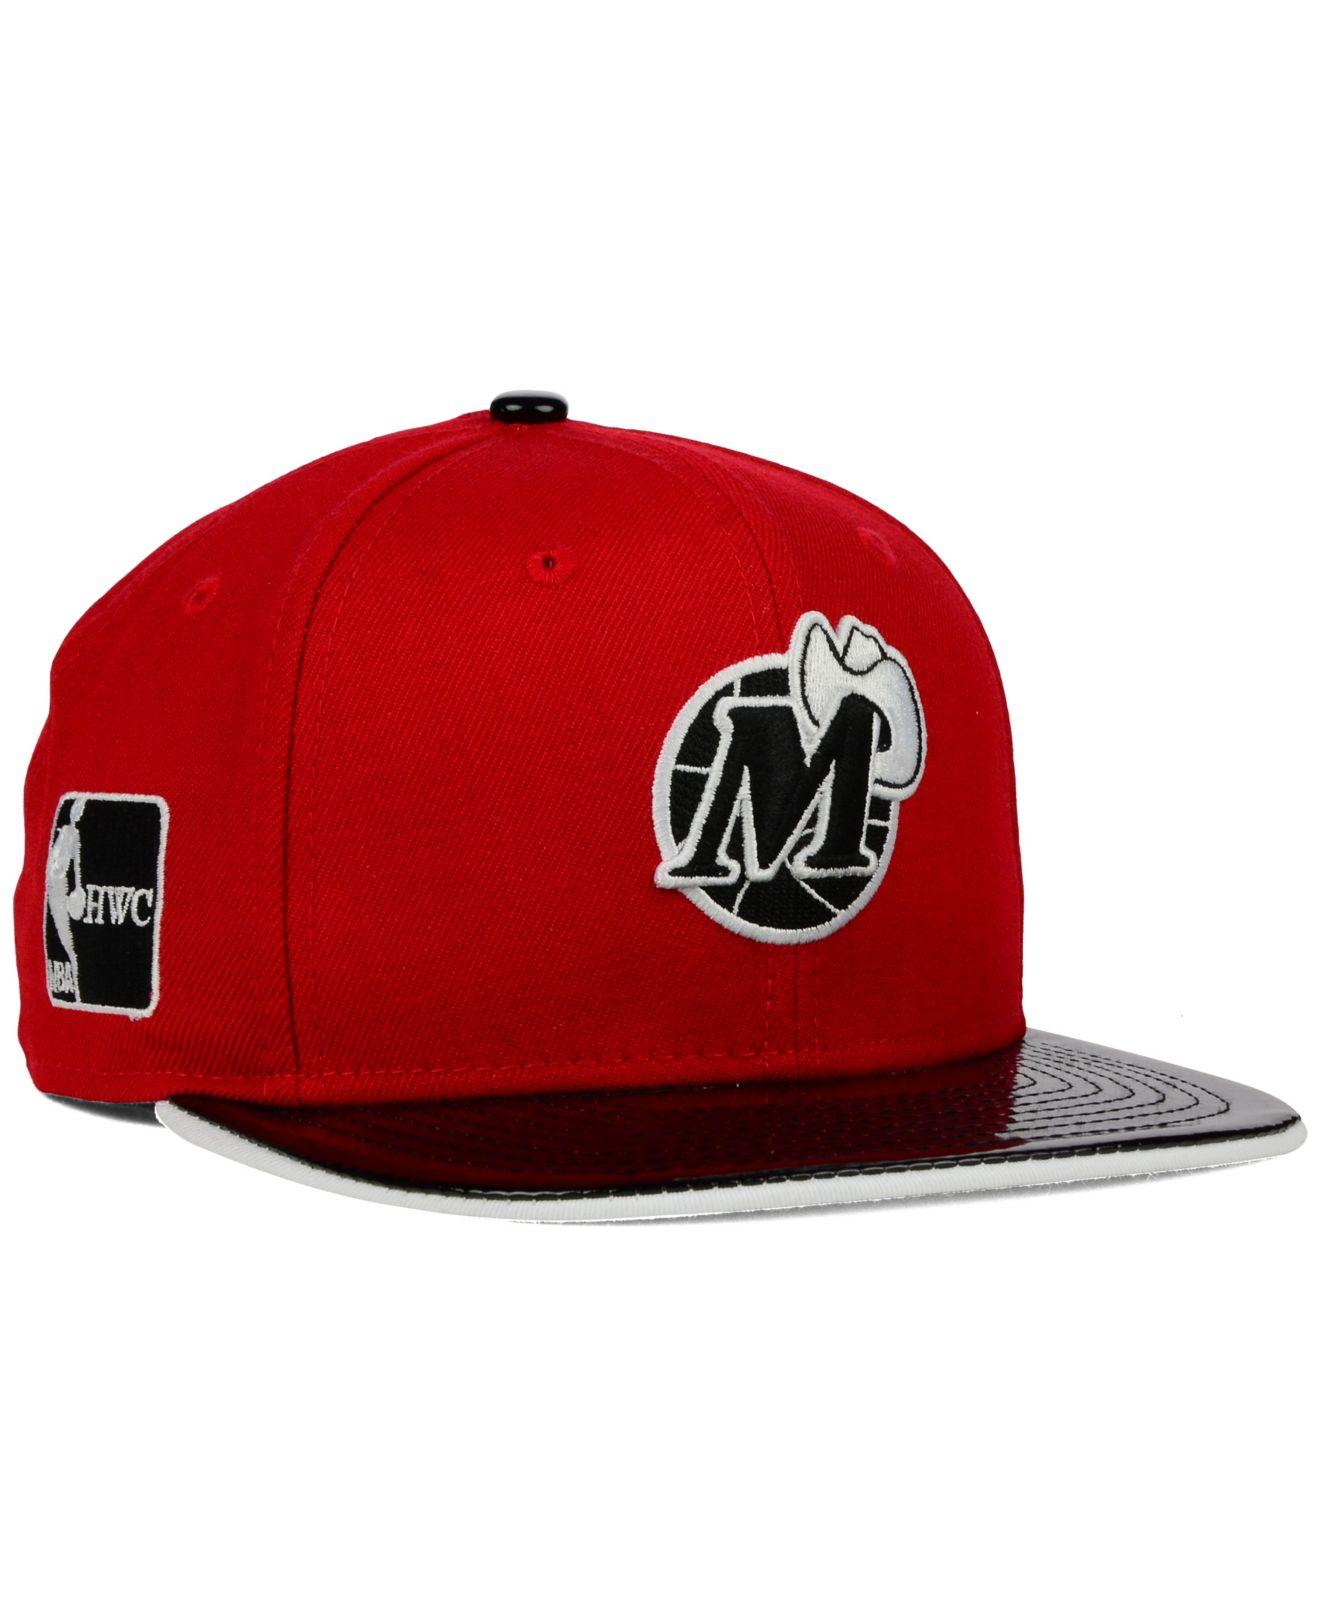 free shipping f8ae1 6b136 ... coupon code for lyst ktz dallas mavericks bred hookup 9fifty snapback  cap in red ea4e7 30cb3 ...